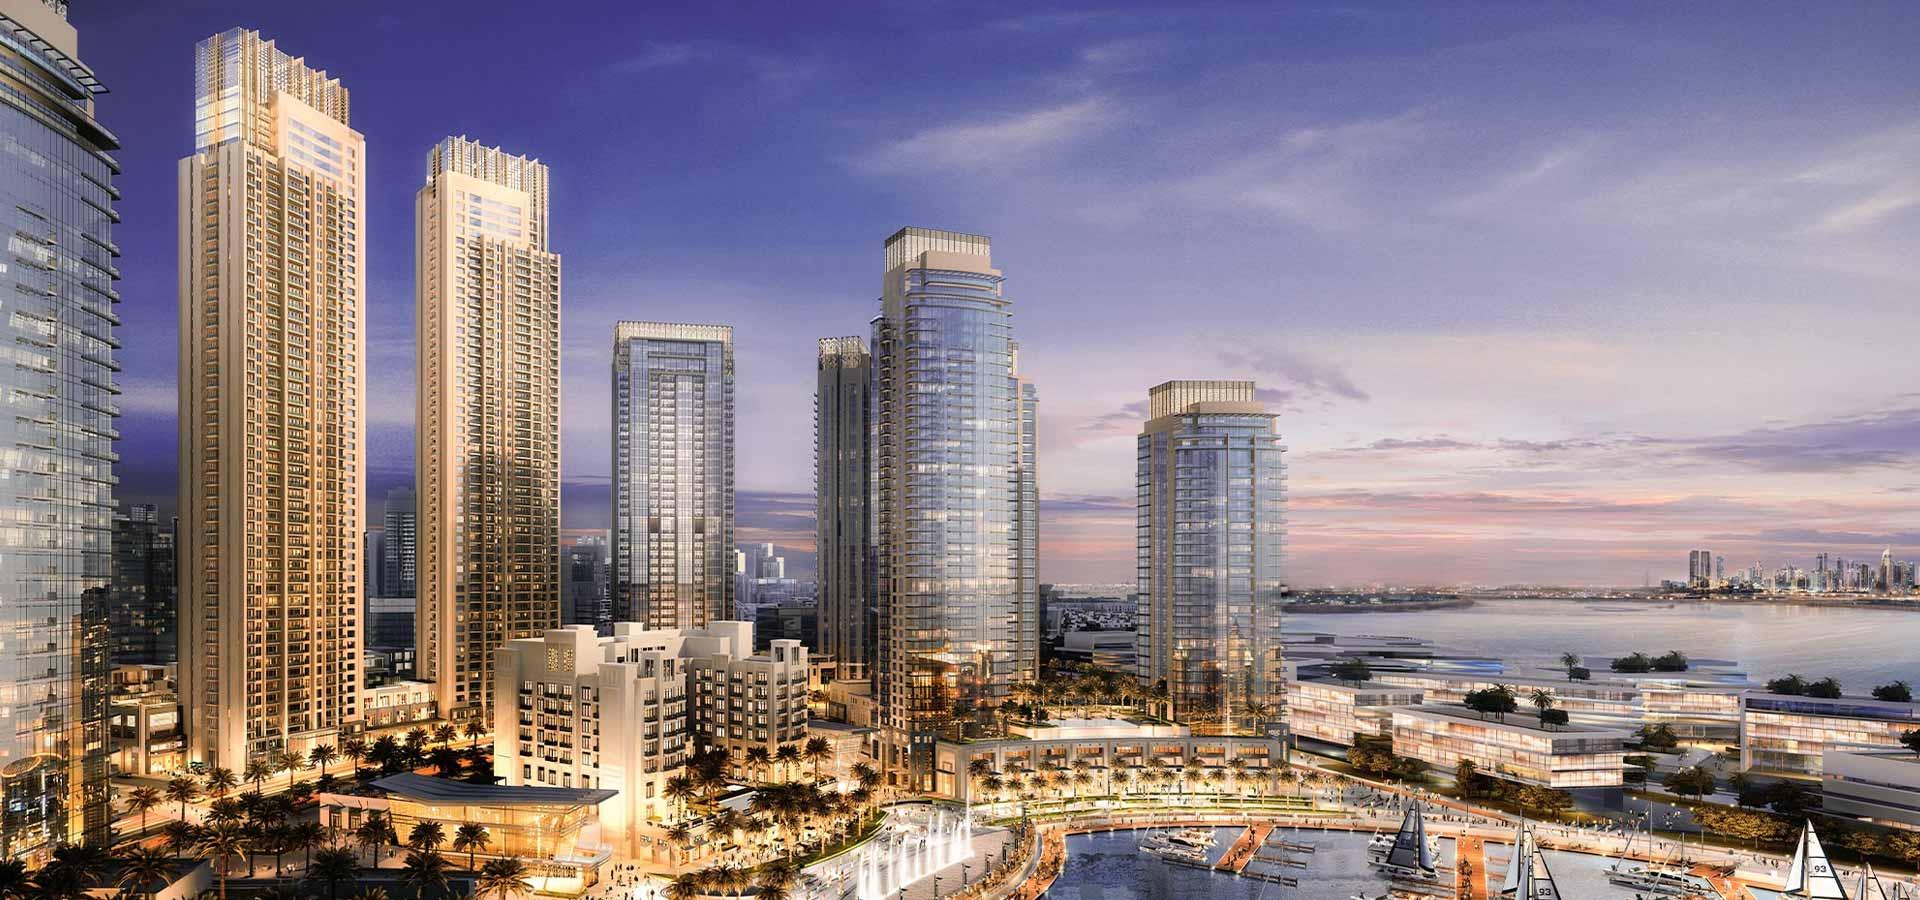 3-bedroom-high-floor-unit-with-burj-khalifa-view-in-harbour-views